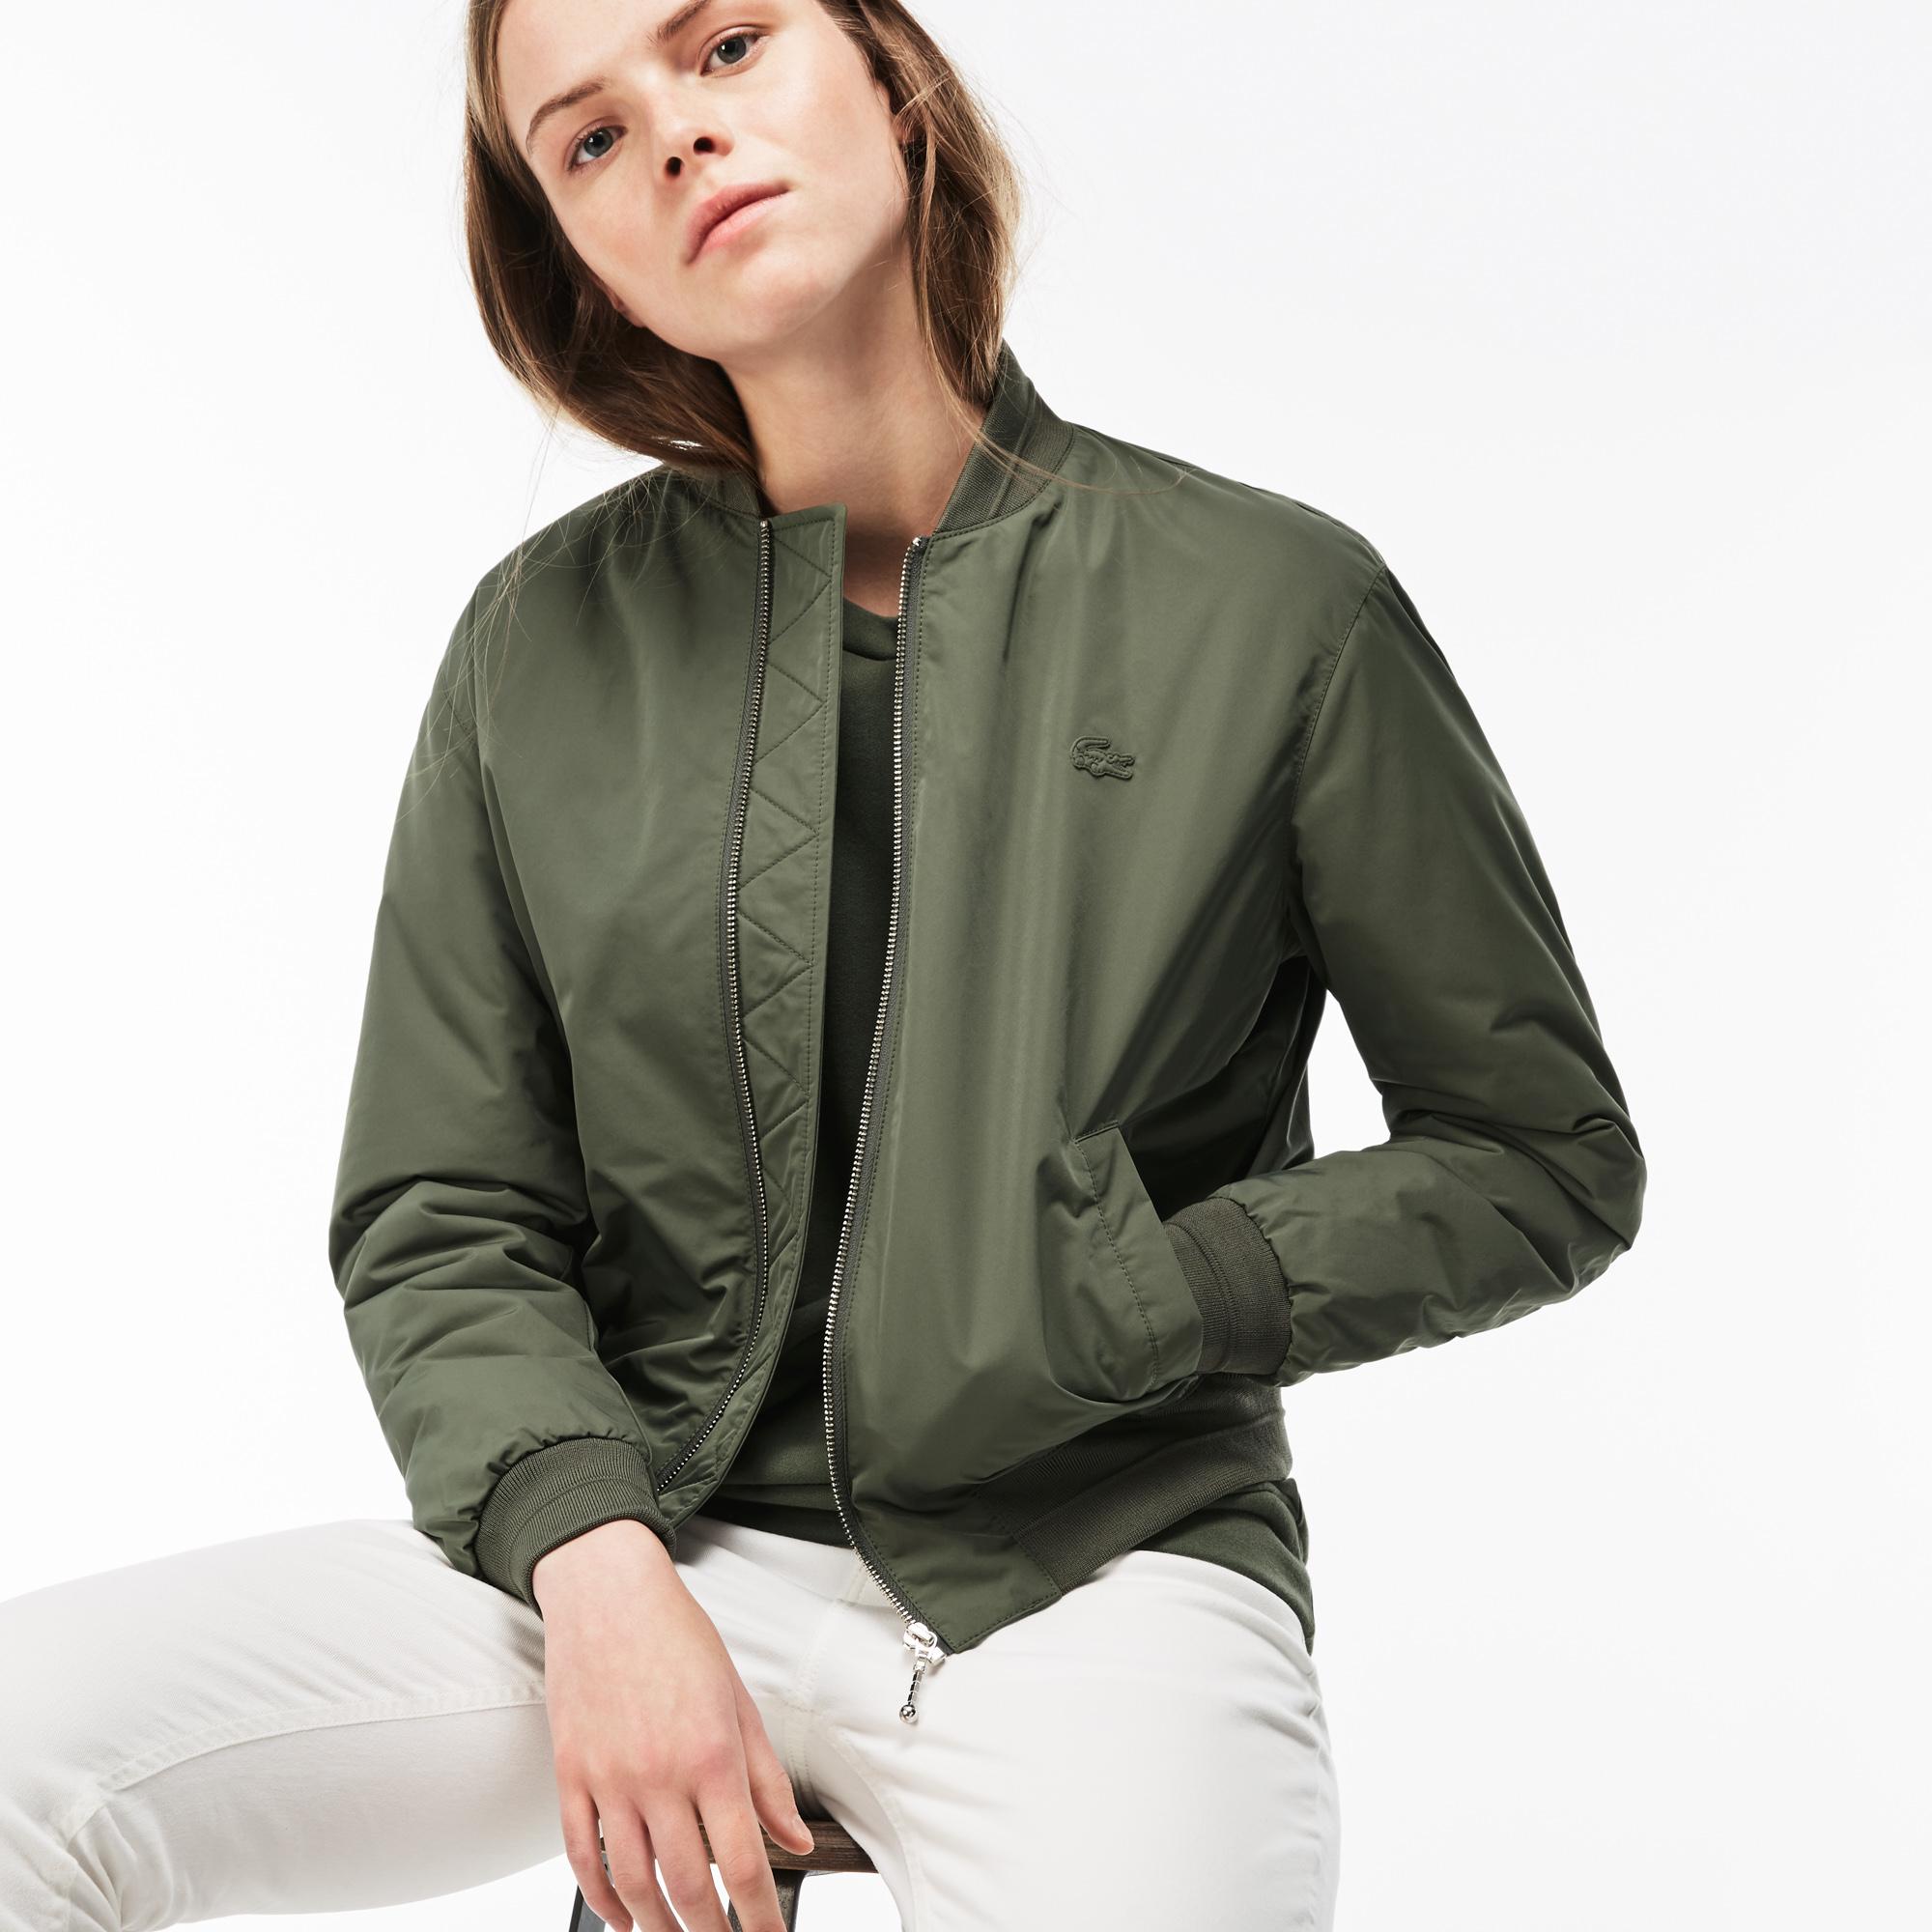 Куртка LacosteВерхняя одежда<br>100% полиамид 100% полиэстер 97% полиэстер 3% эластан